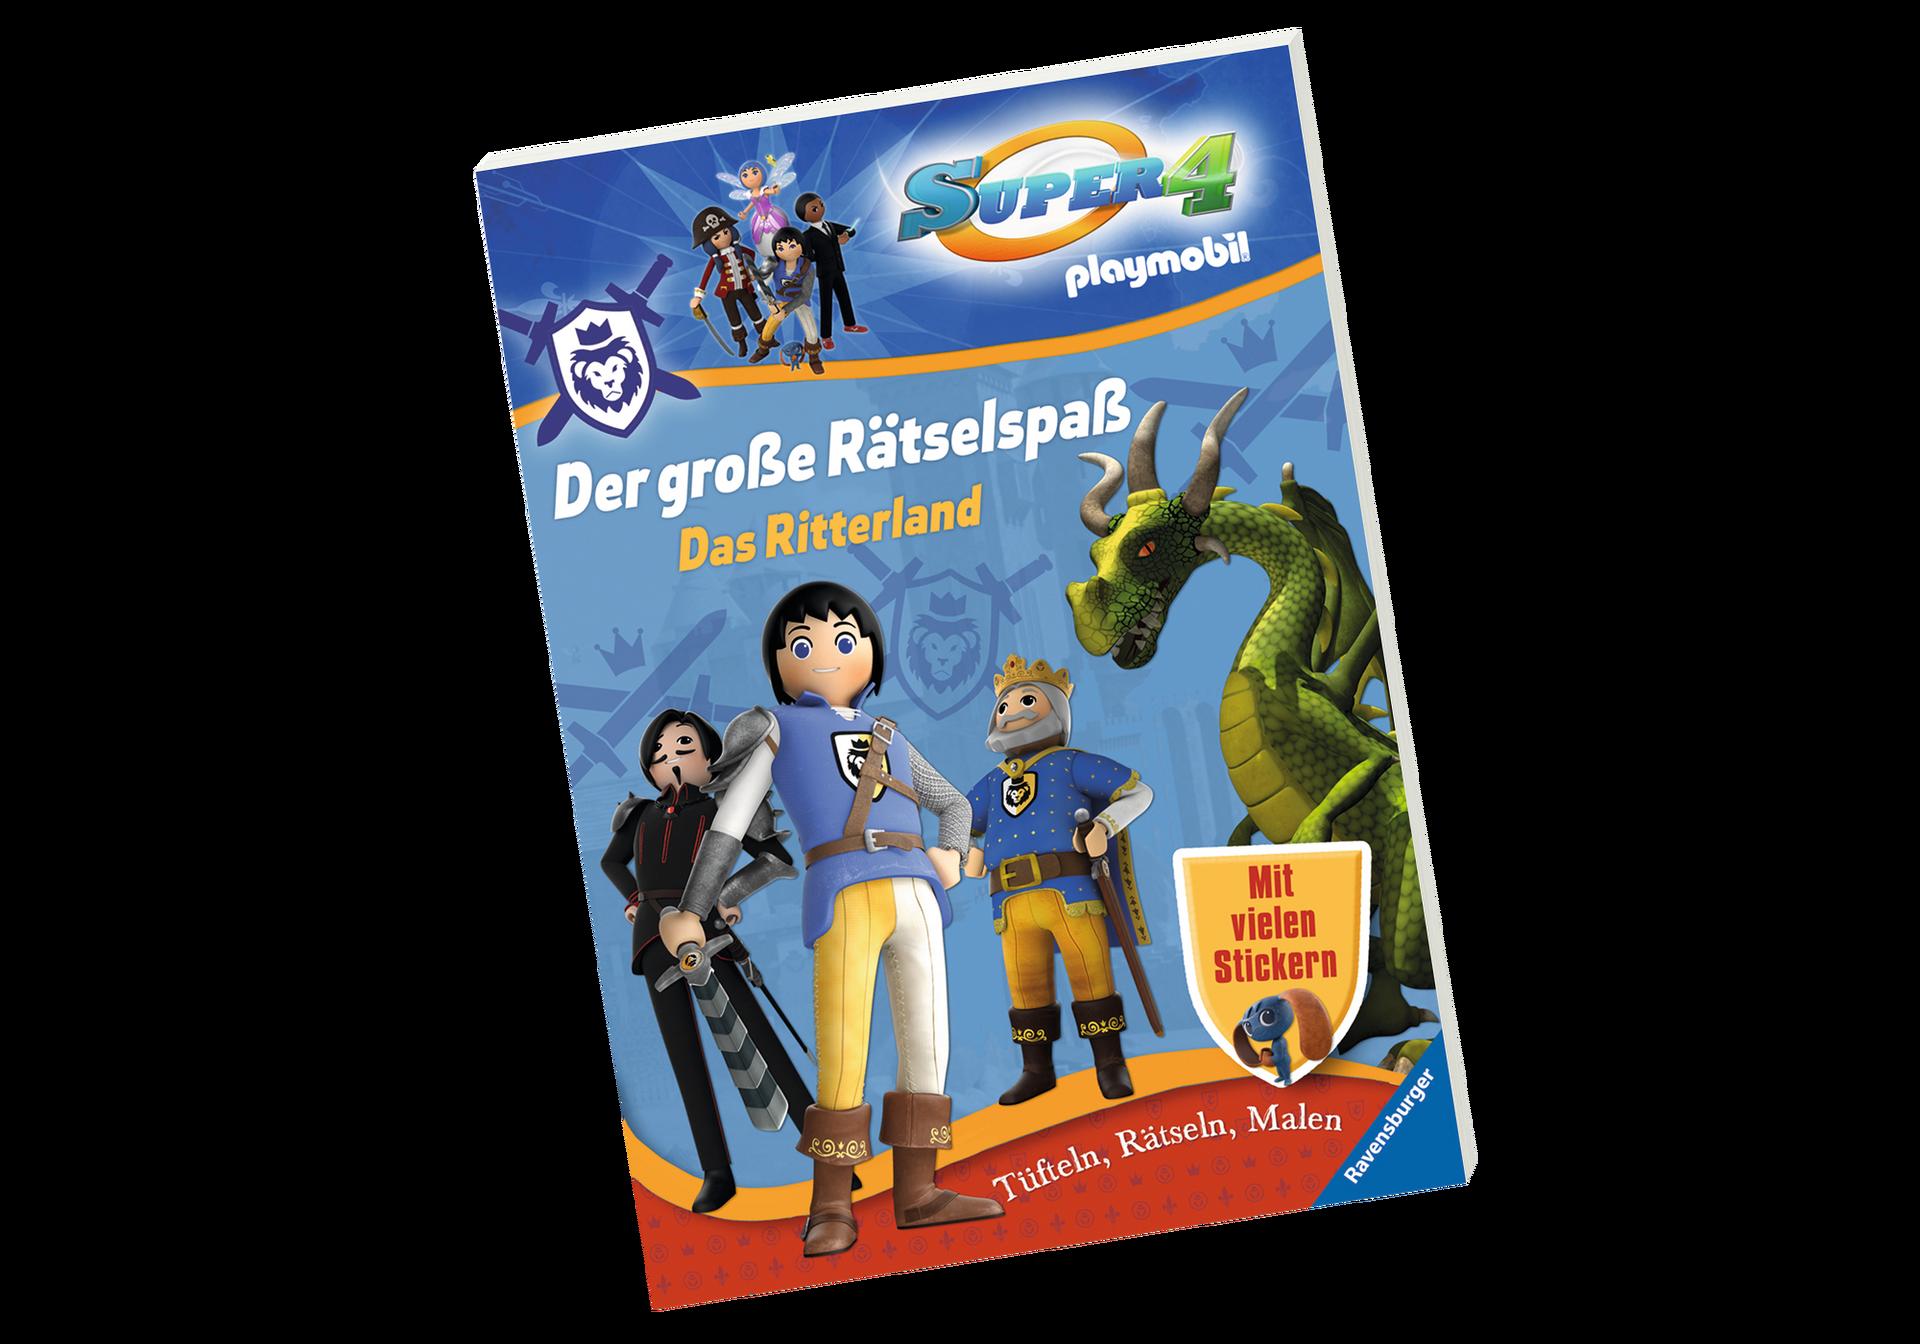 Playmobil Drachenland Ausmalbilder : Super 4 Der Gro E R Tselspa Das Ritterland 80472 Playmobil